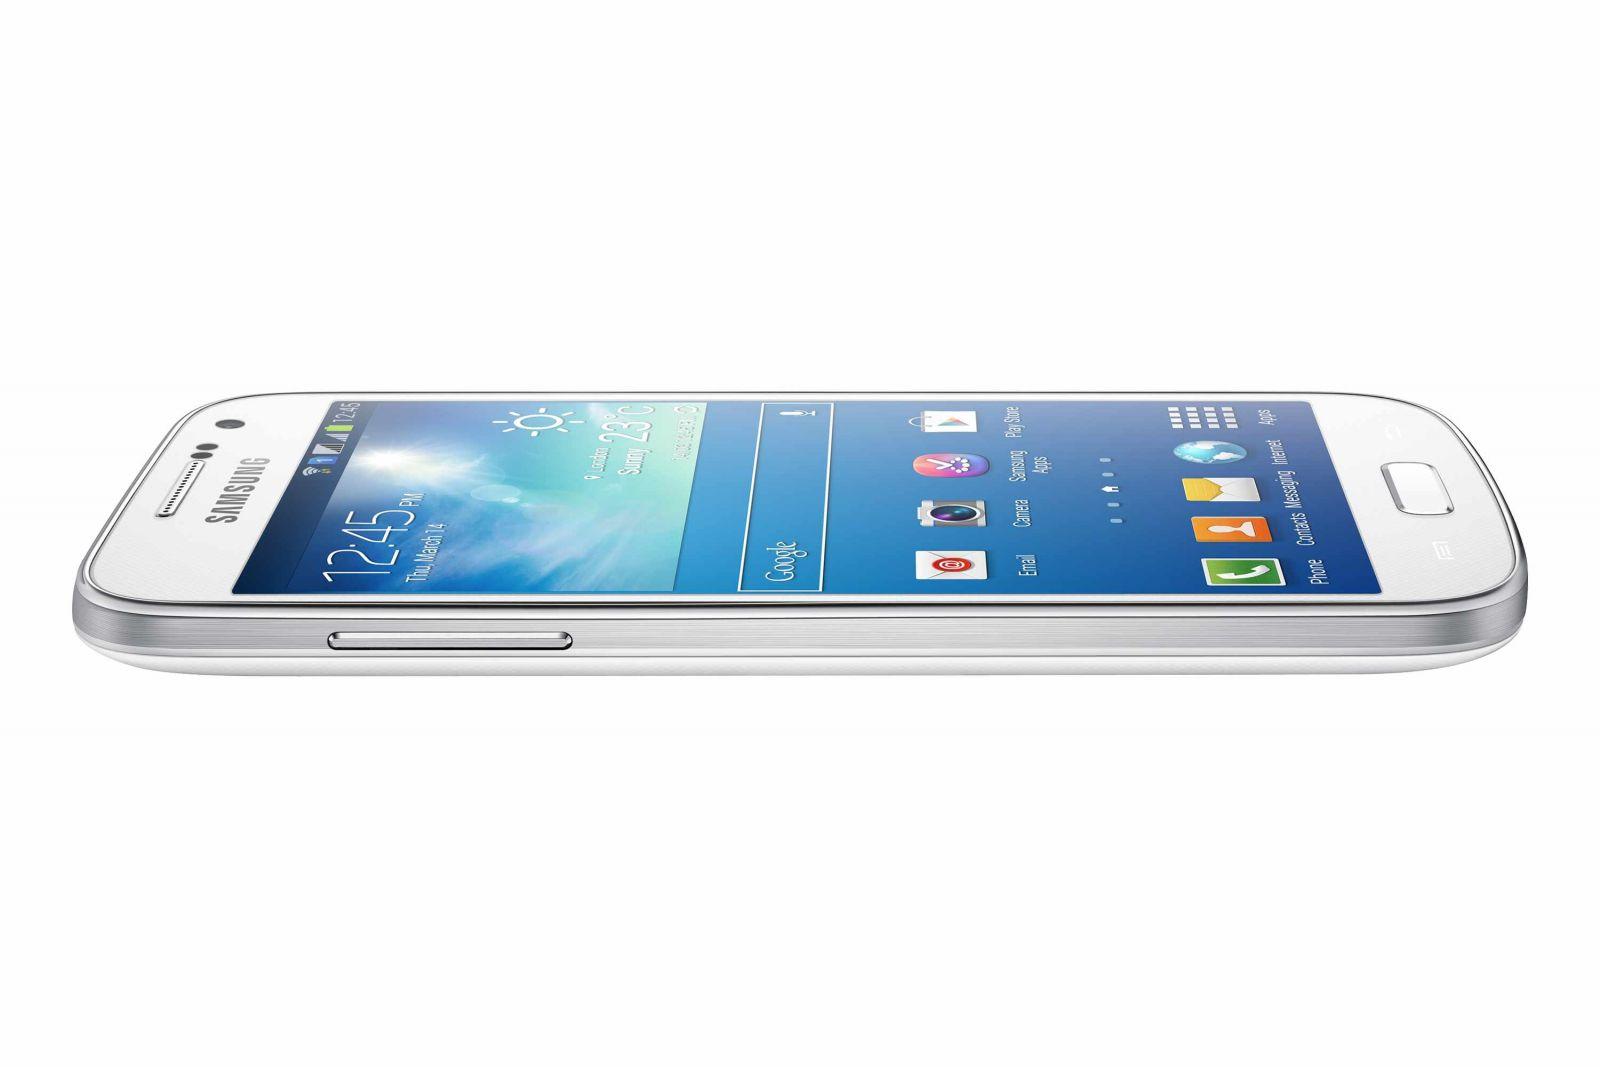 Samsung Galaxy S4 Mini: все для счастливой жизни - фото №1